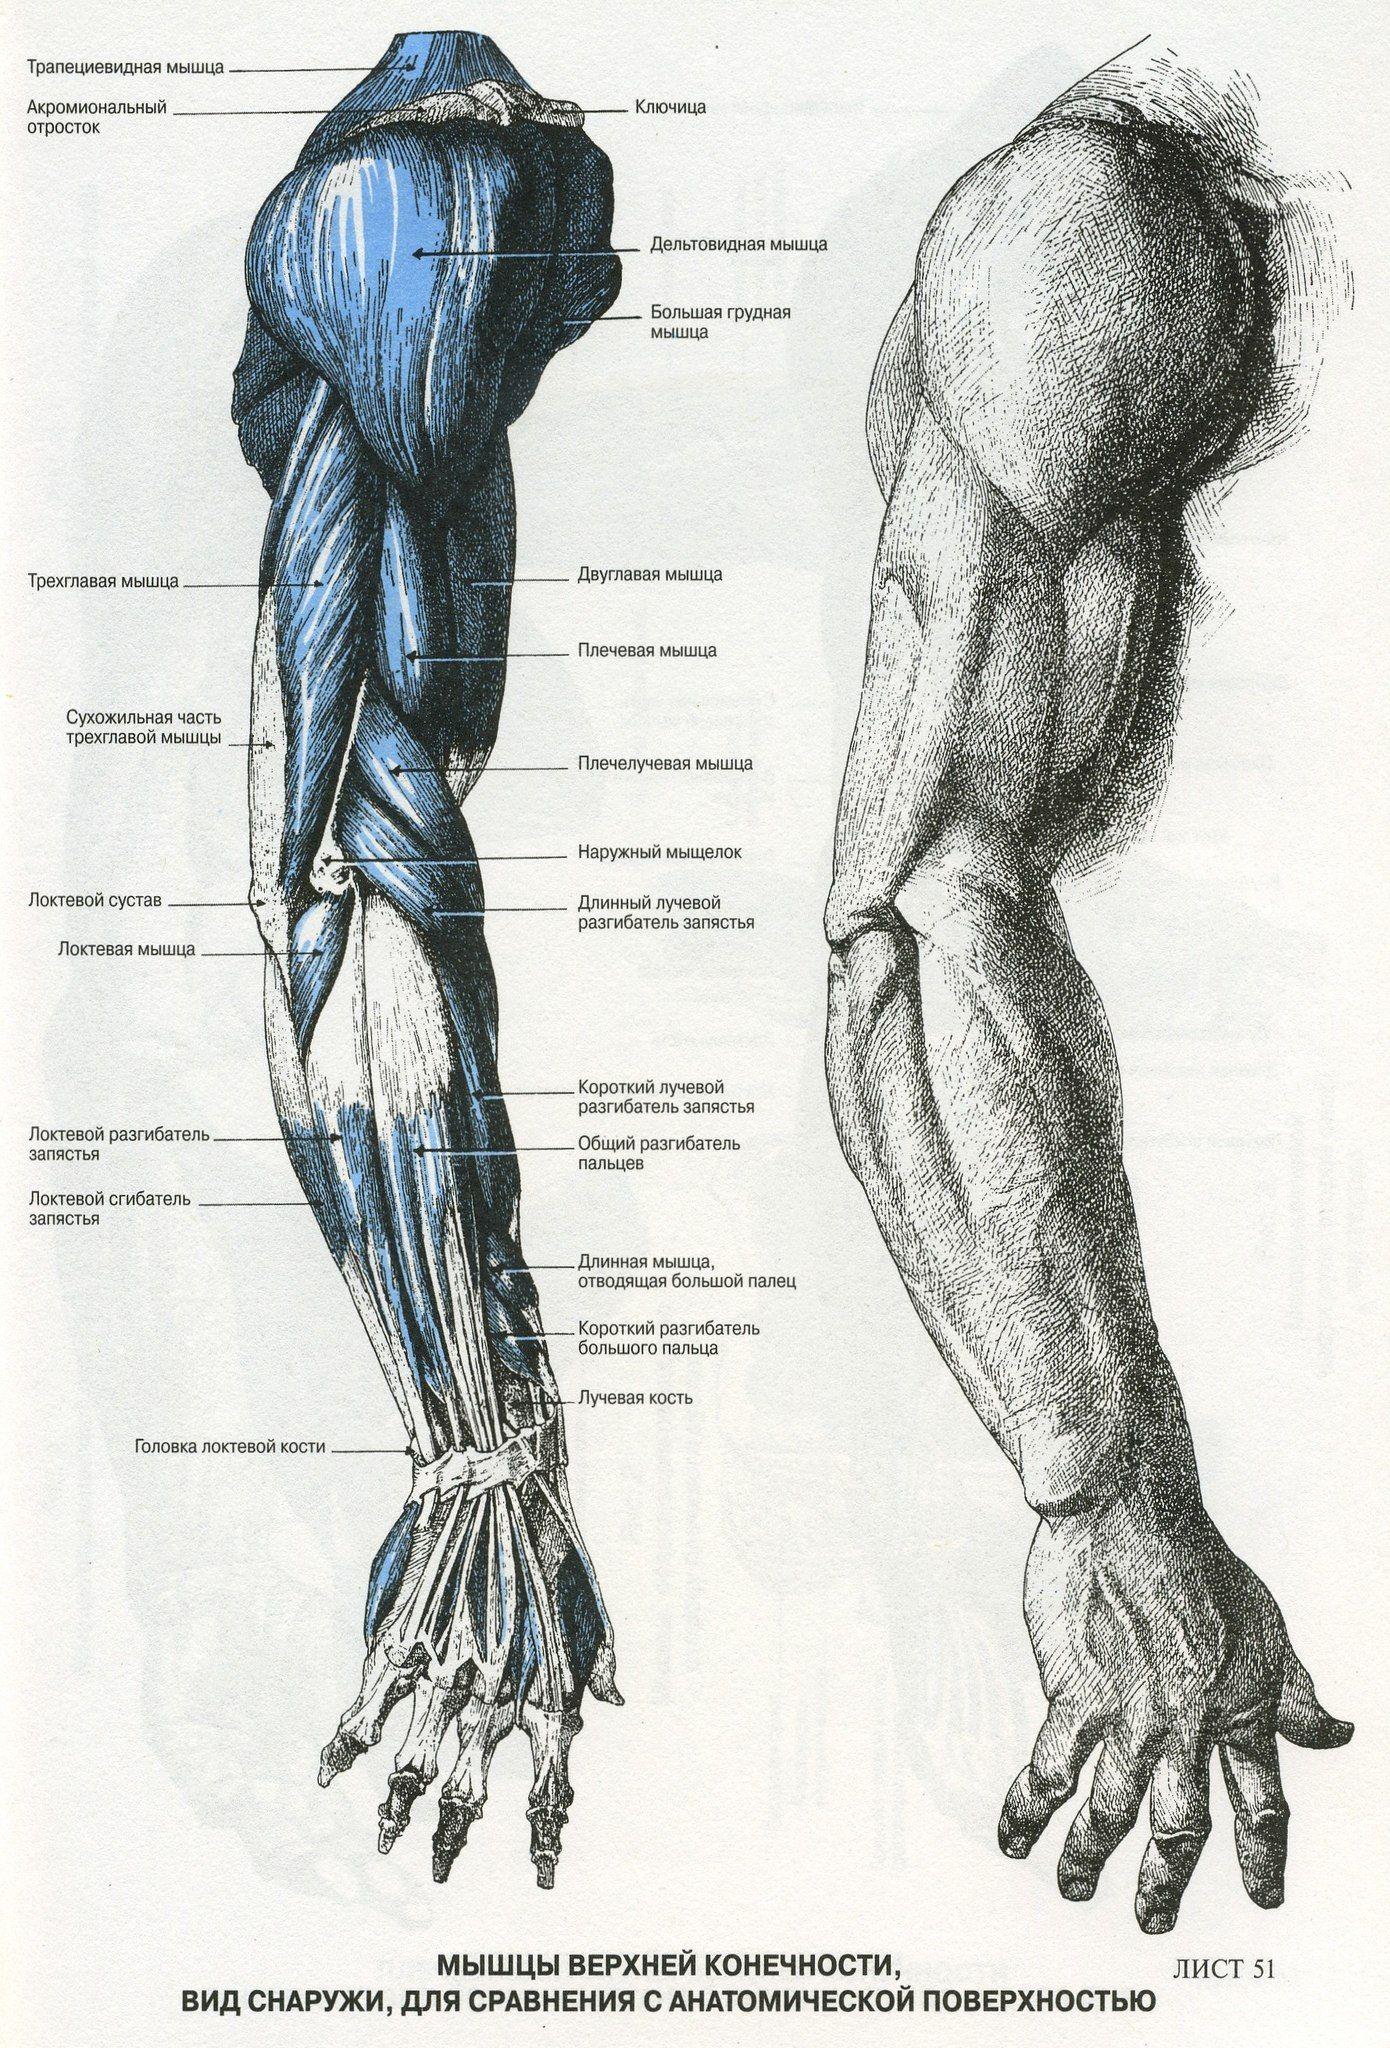 BaekKhJl7mw.jpg (1390×2048)   Anatomia   Pinterest   Anatomía ...